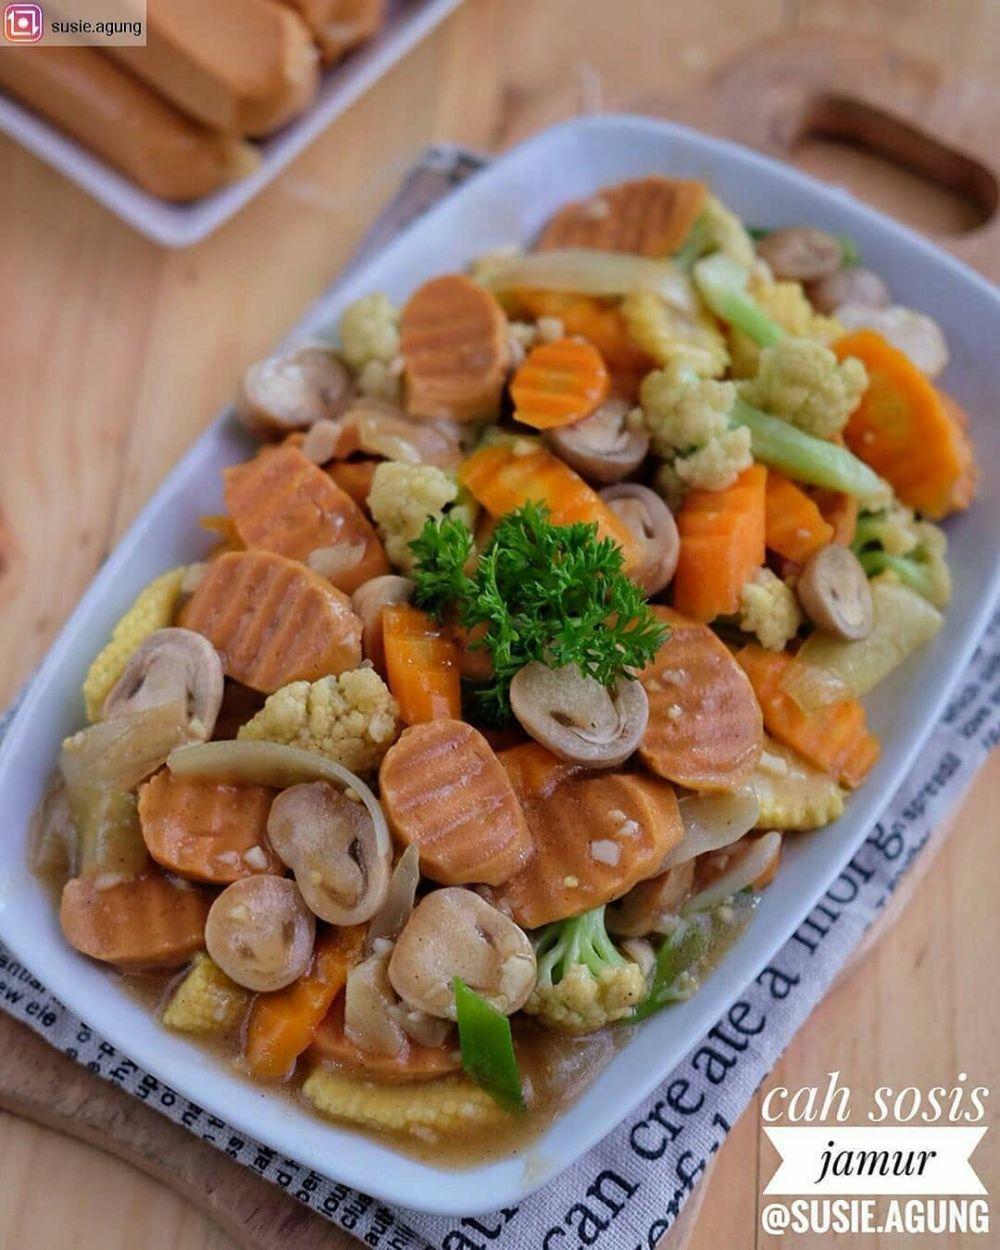 Resep cah jamur ala rumahan cookpad ; Instagram © 2021 brilio.net